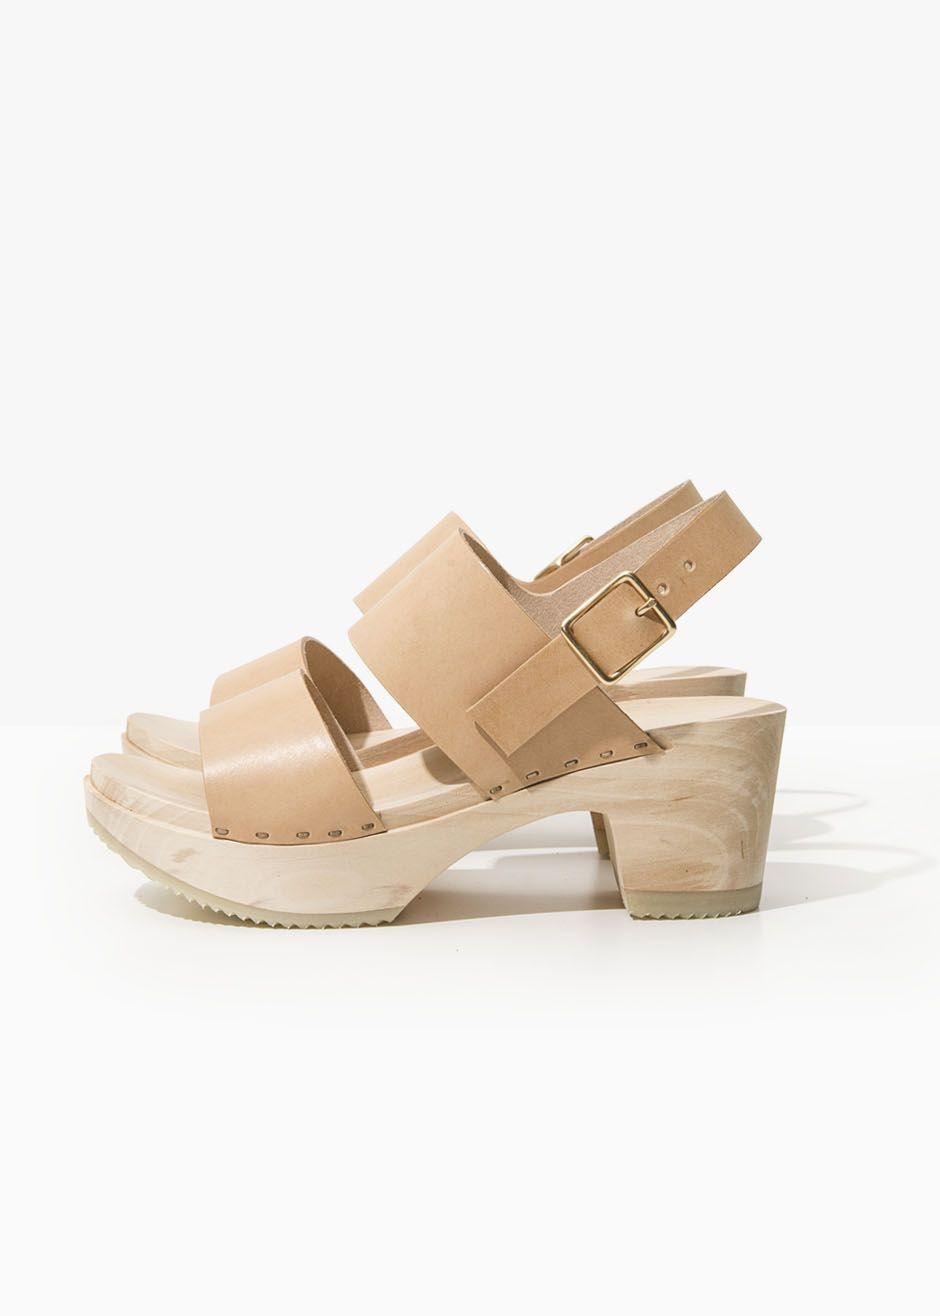 b7d44cfec5a0 CLOG SANDAL – NATURAL – Zuzii Footwear – Made in LA